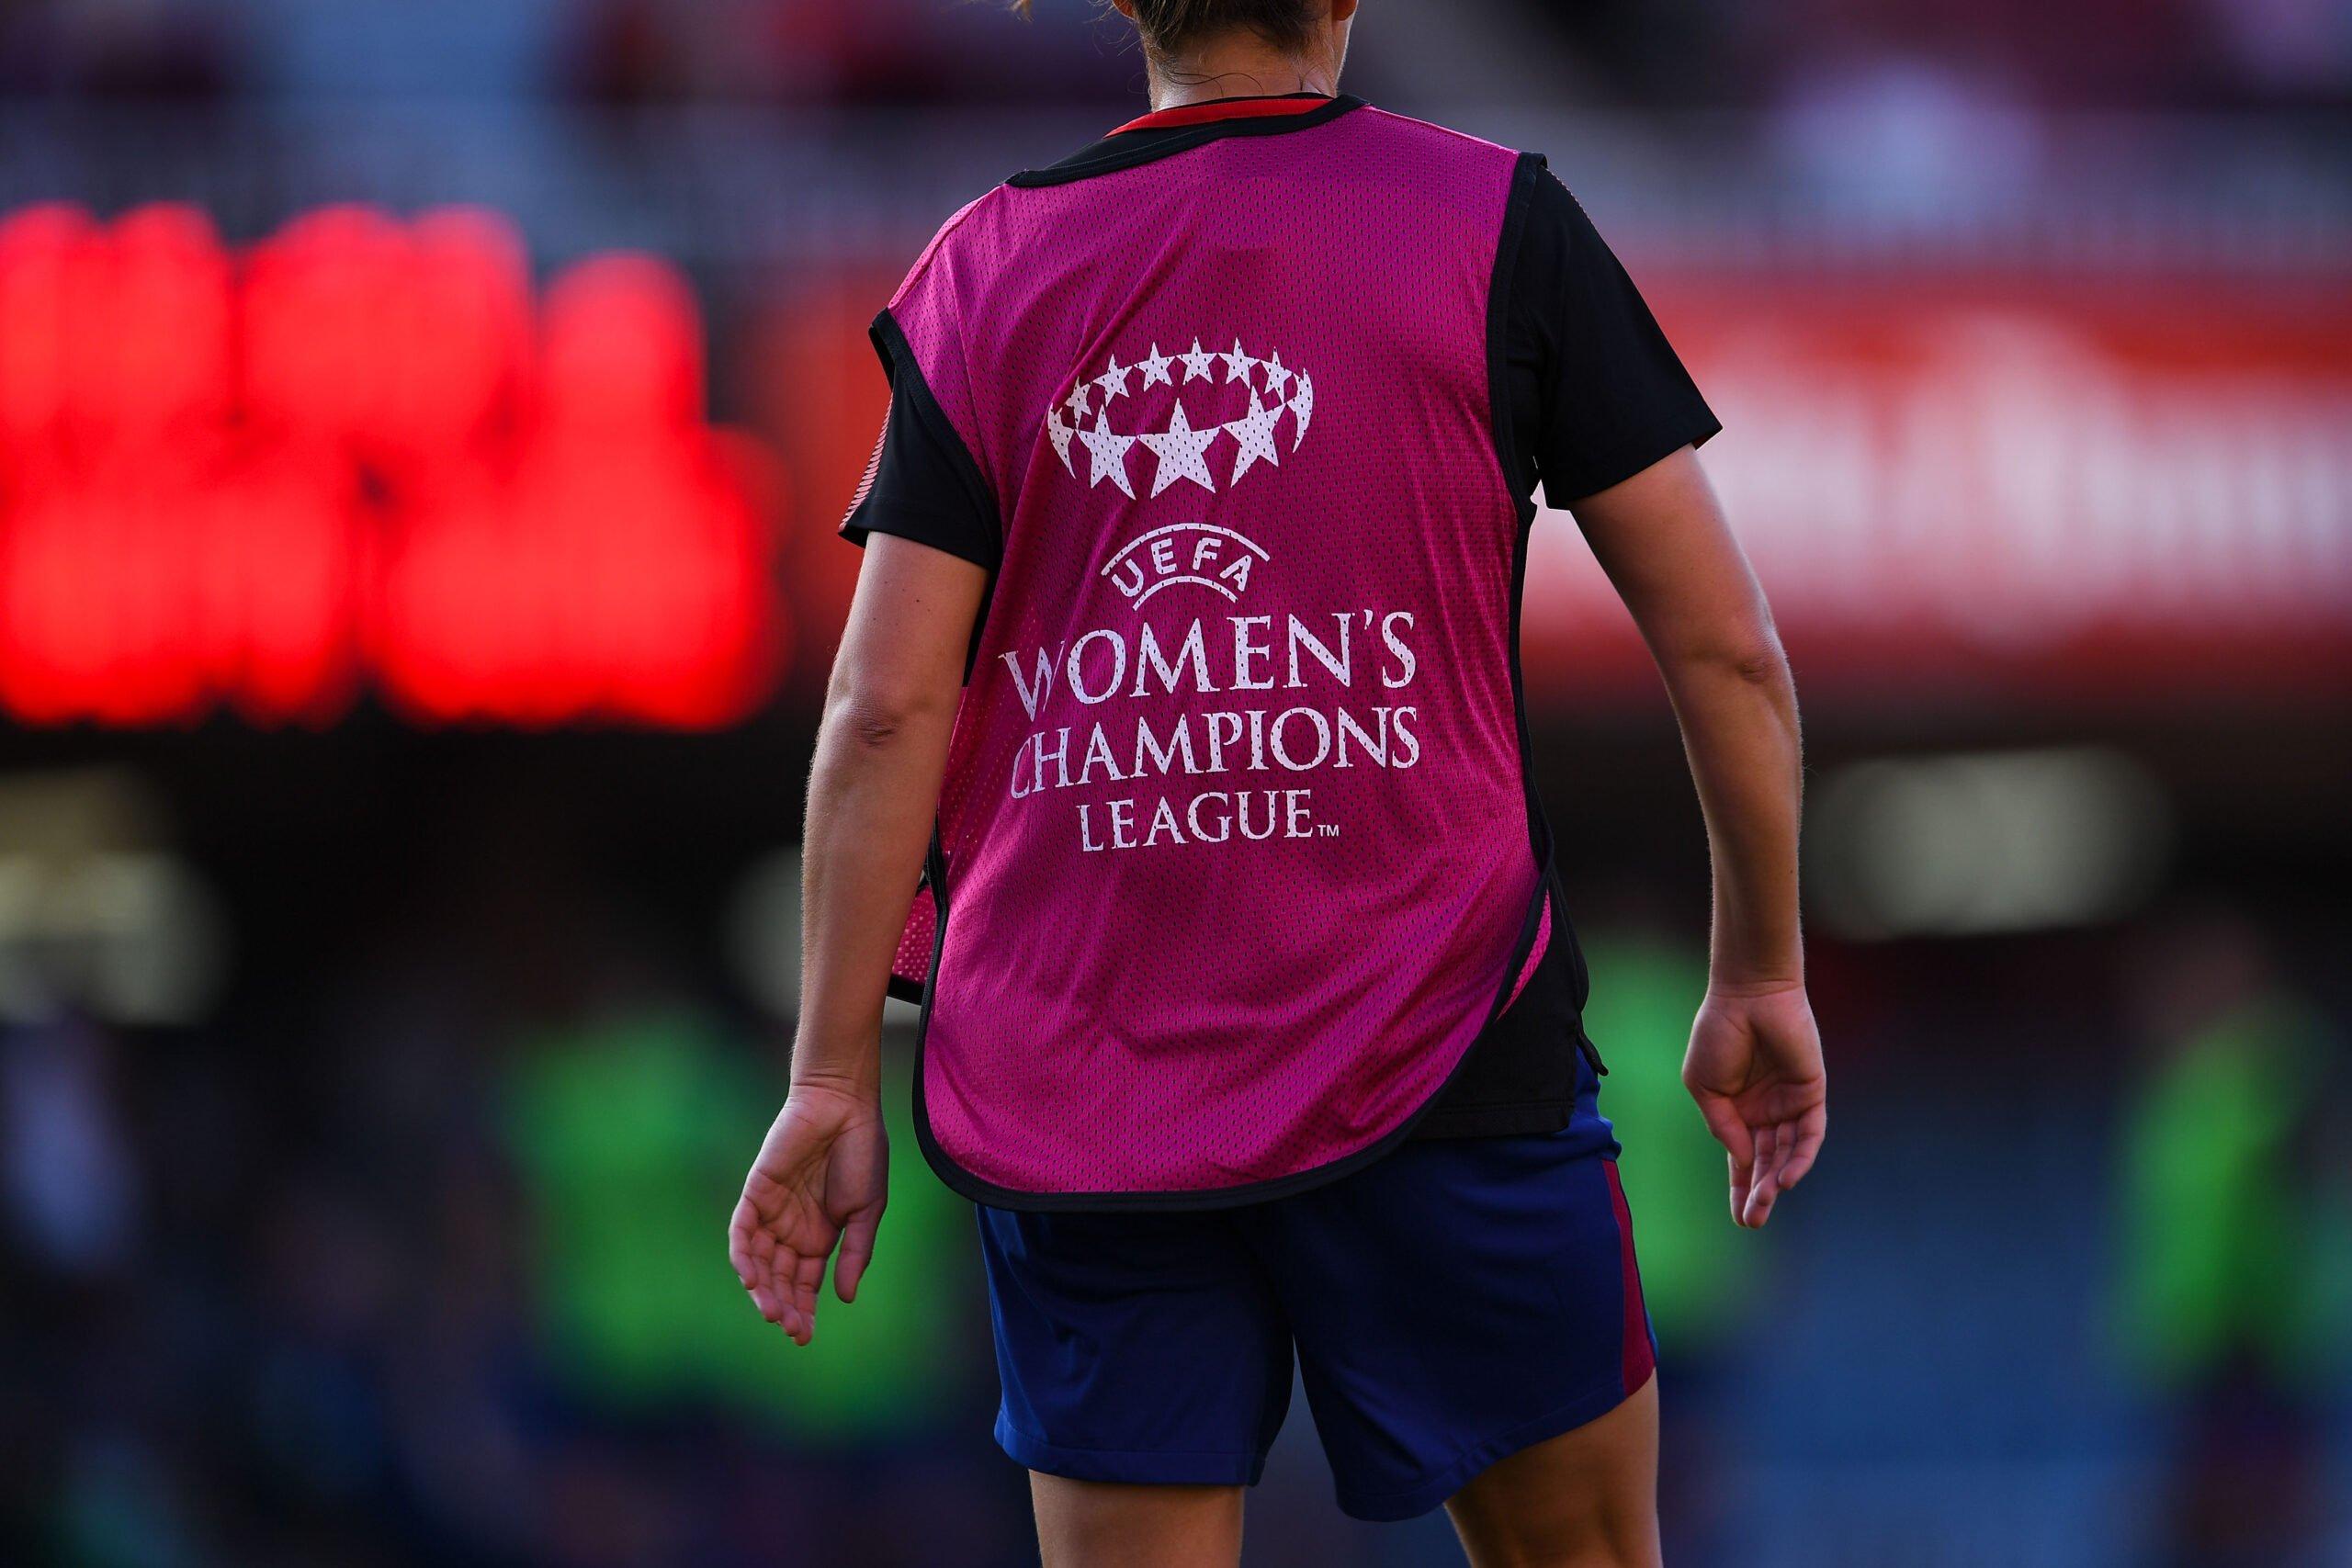 UEFA Women' Champions League